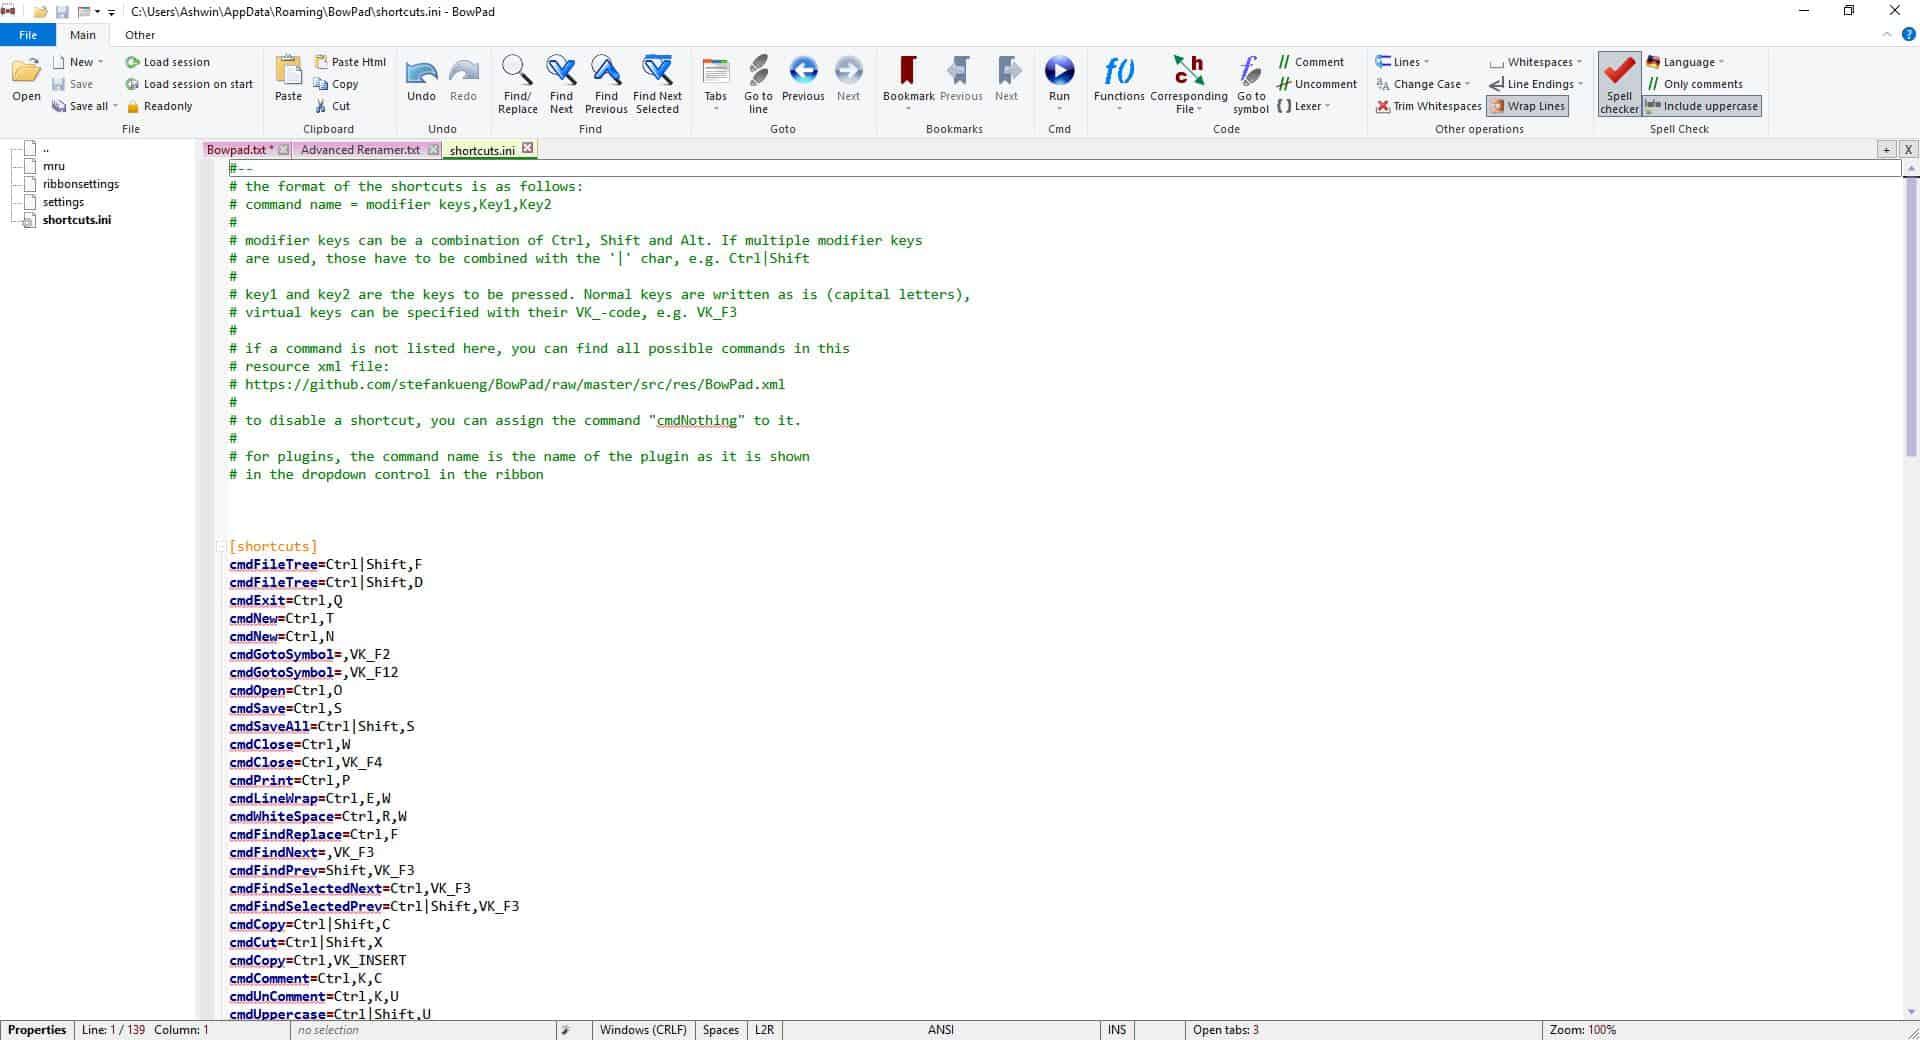 BowPad syntax